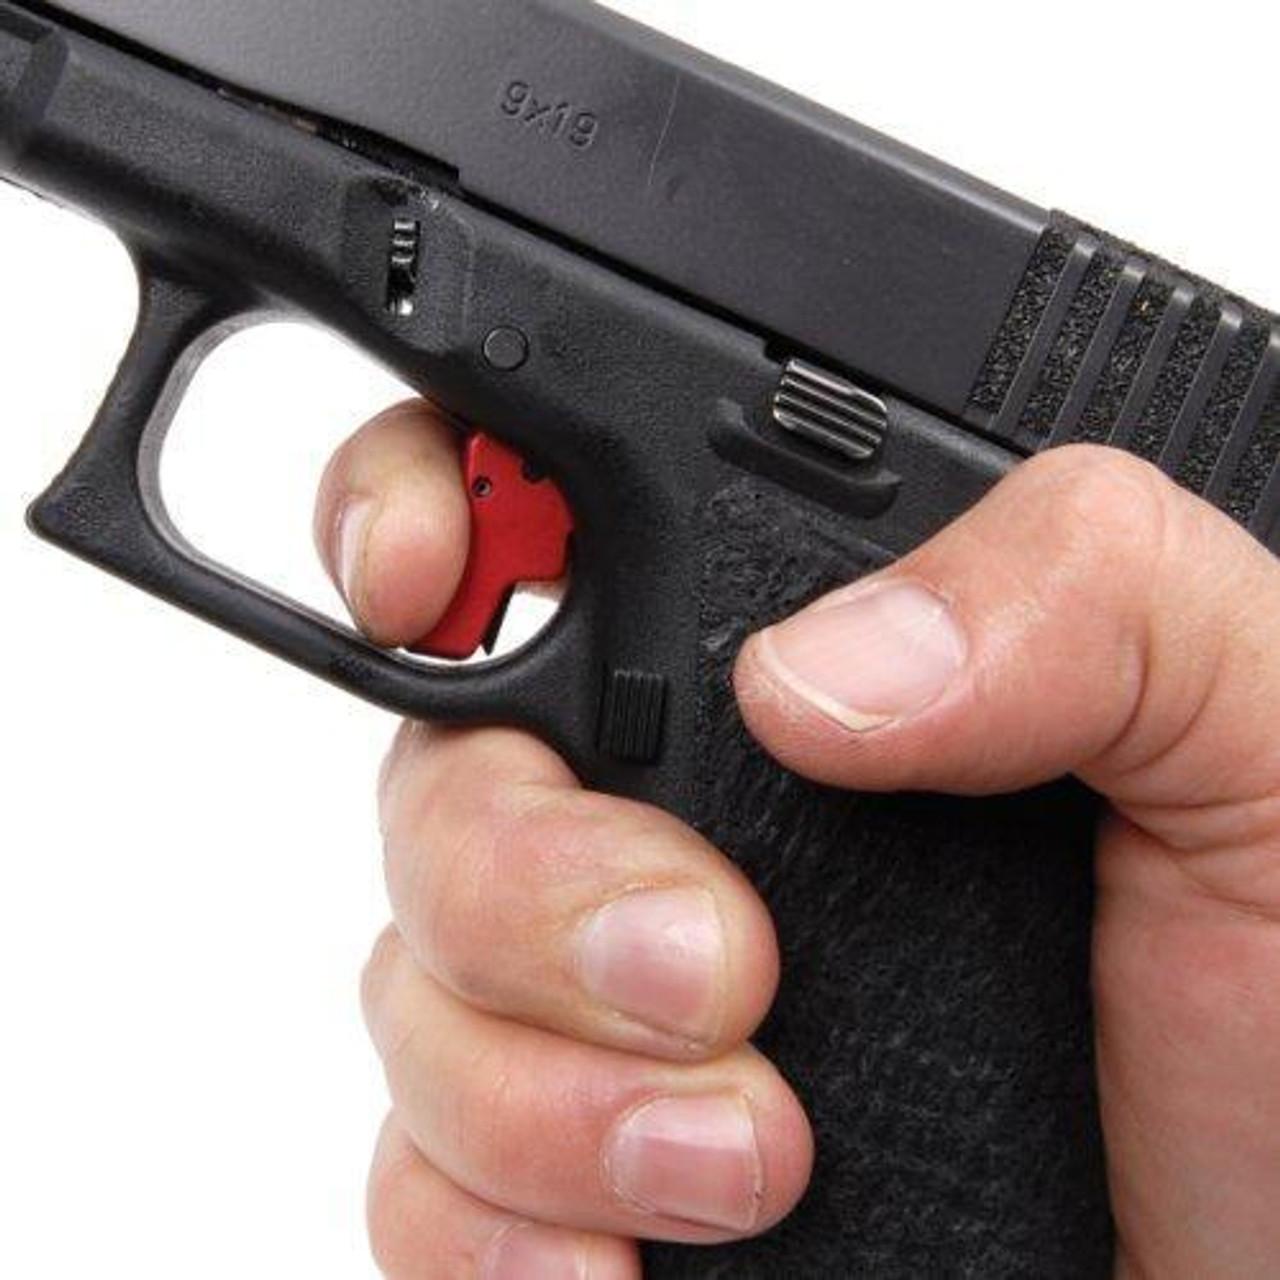 APEX Tactical Action Enhancement Trigger For GLOCK | Black